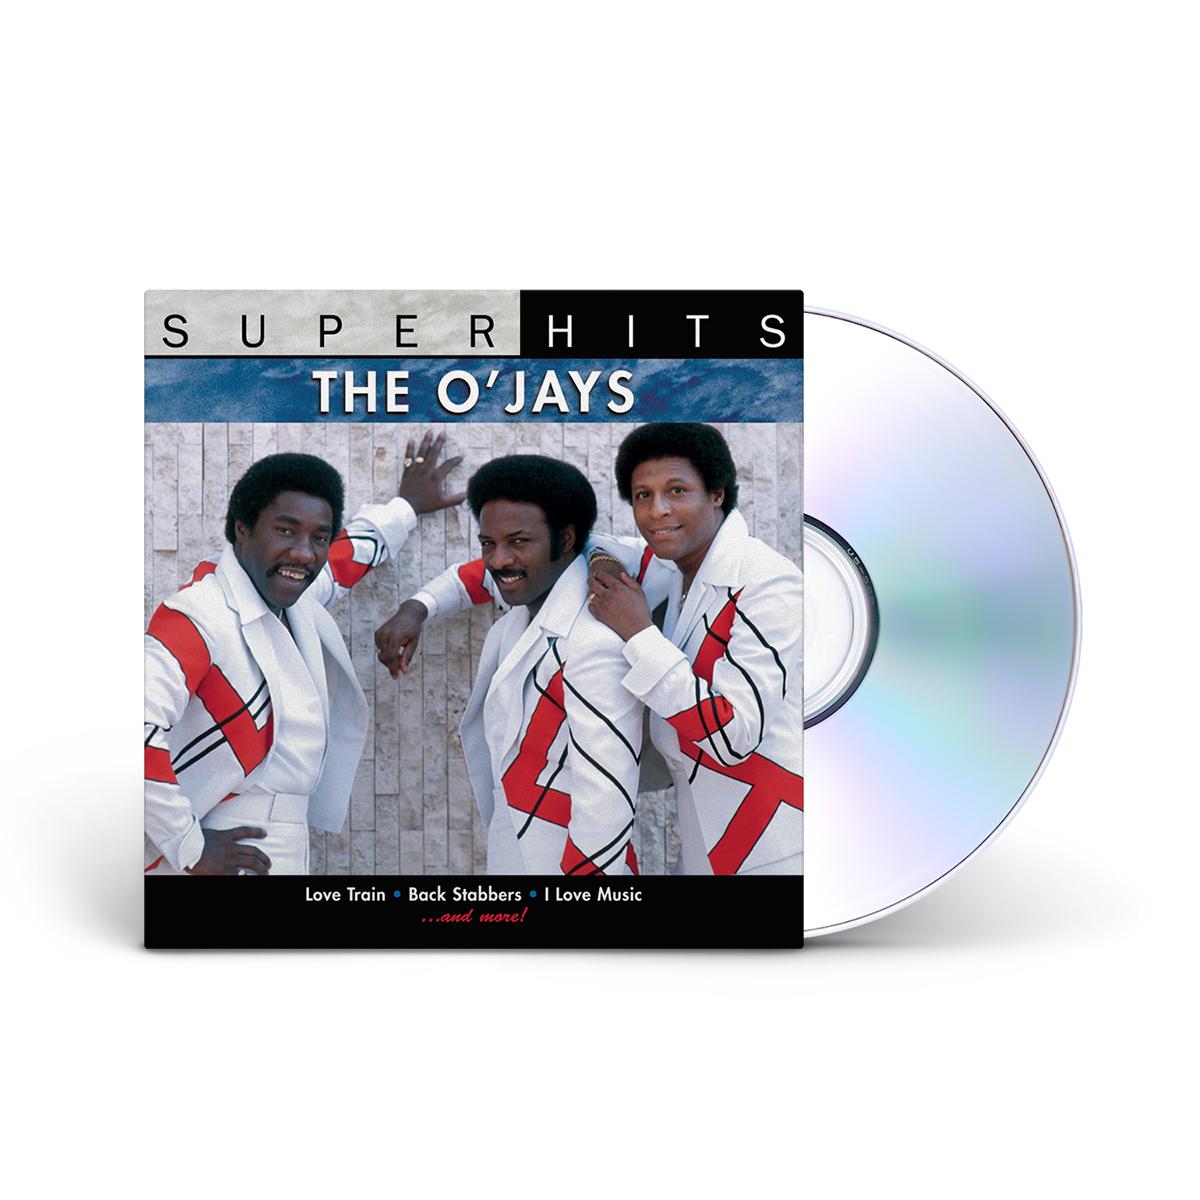 The O'Jays - Super Hits CD